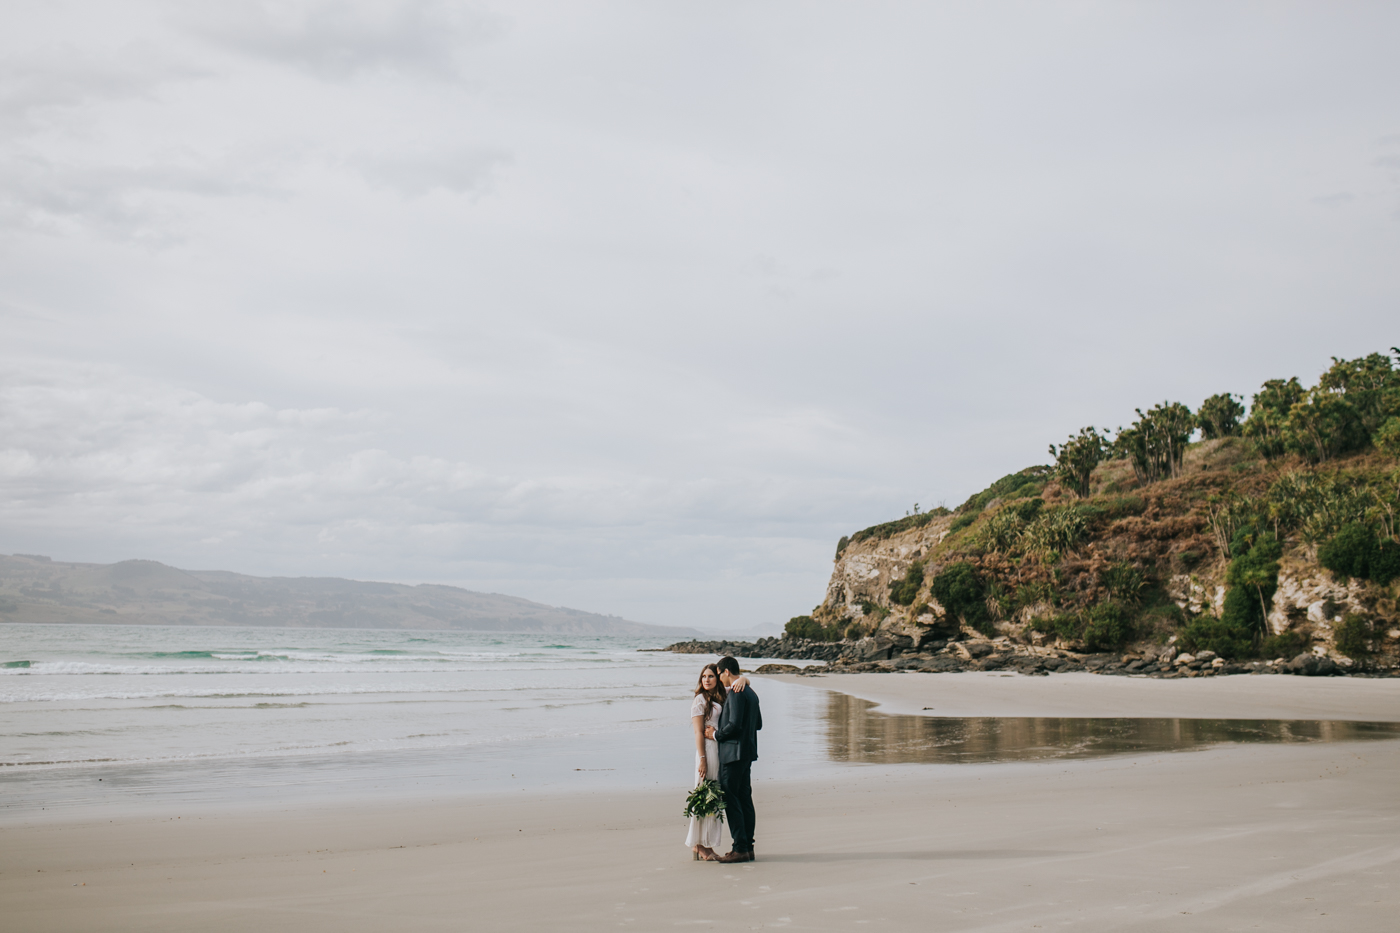 Ariana & Tim - Dunedin, New Zealand Wedding - Destination Wedding - Samantha Heather Photography-164.jpg